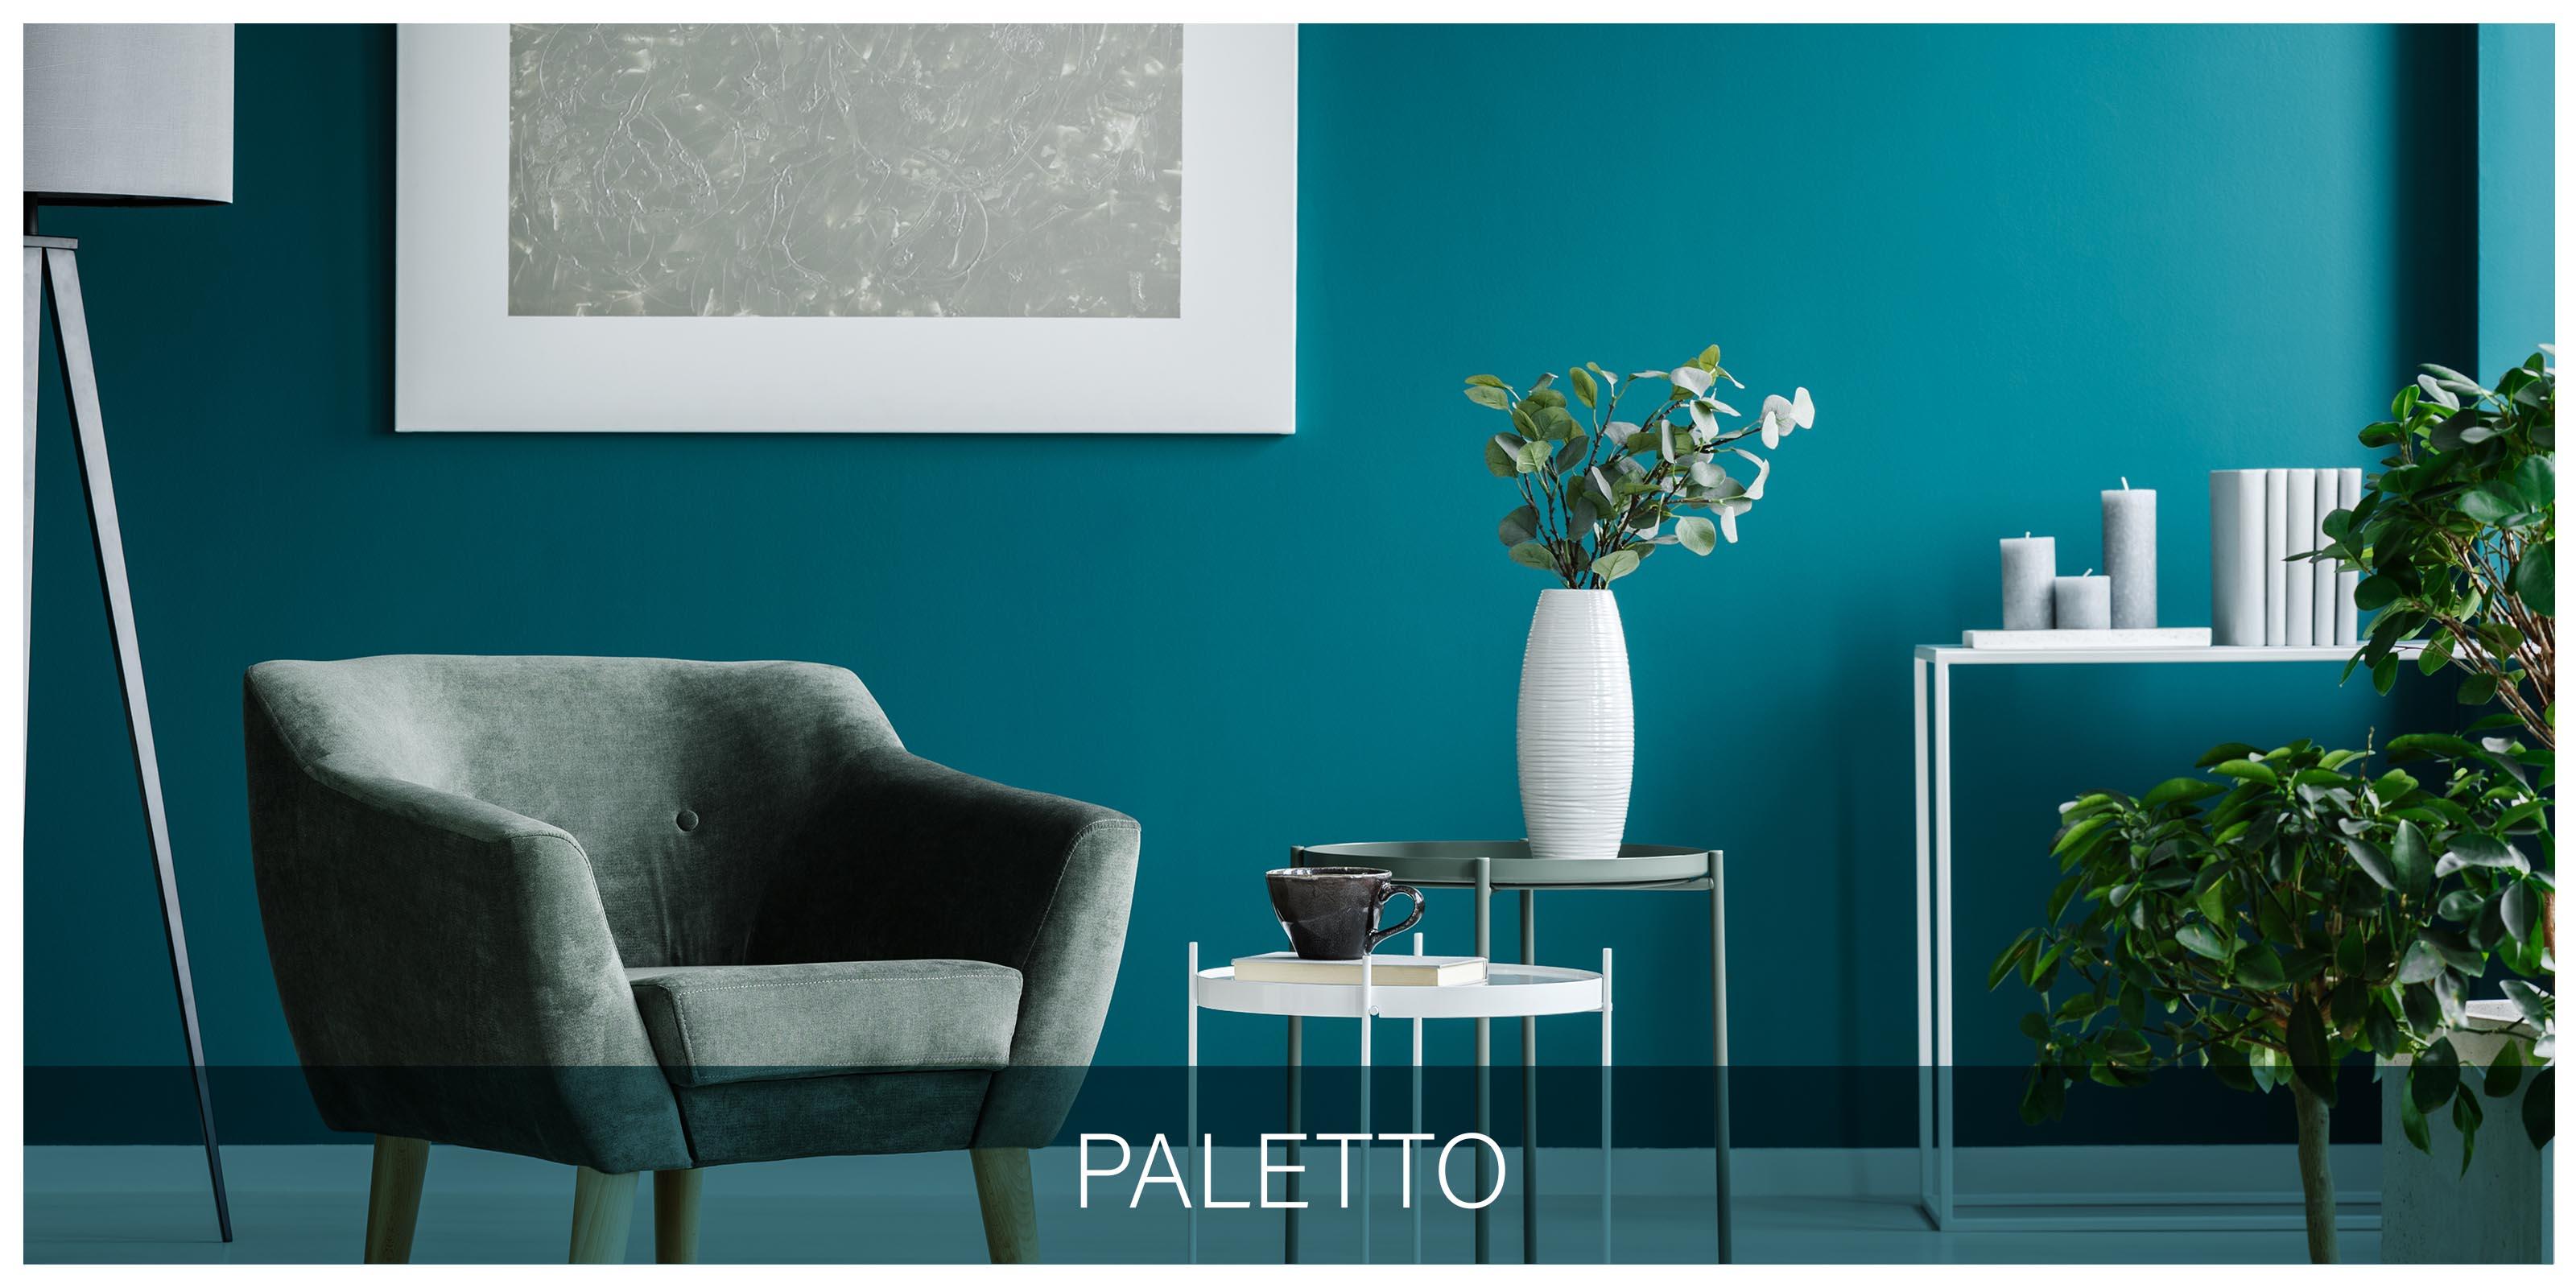 paletto 2blok-sfeer-tekst